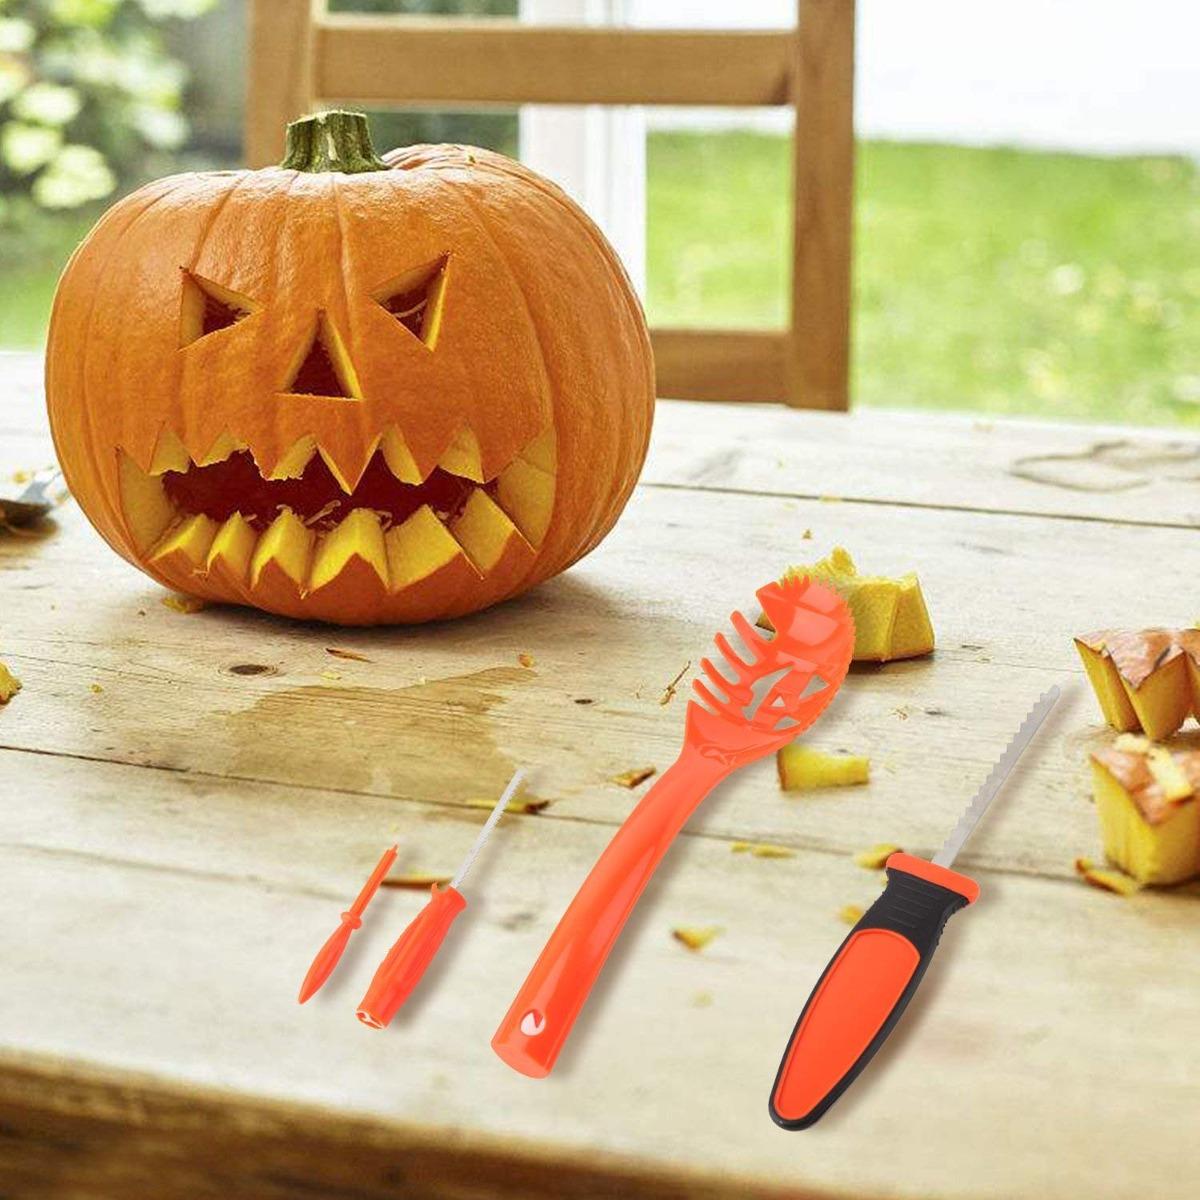 Equipo Tallado Calabaza De Halloween Niños Merrymore 4 Cala ...